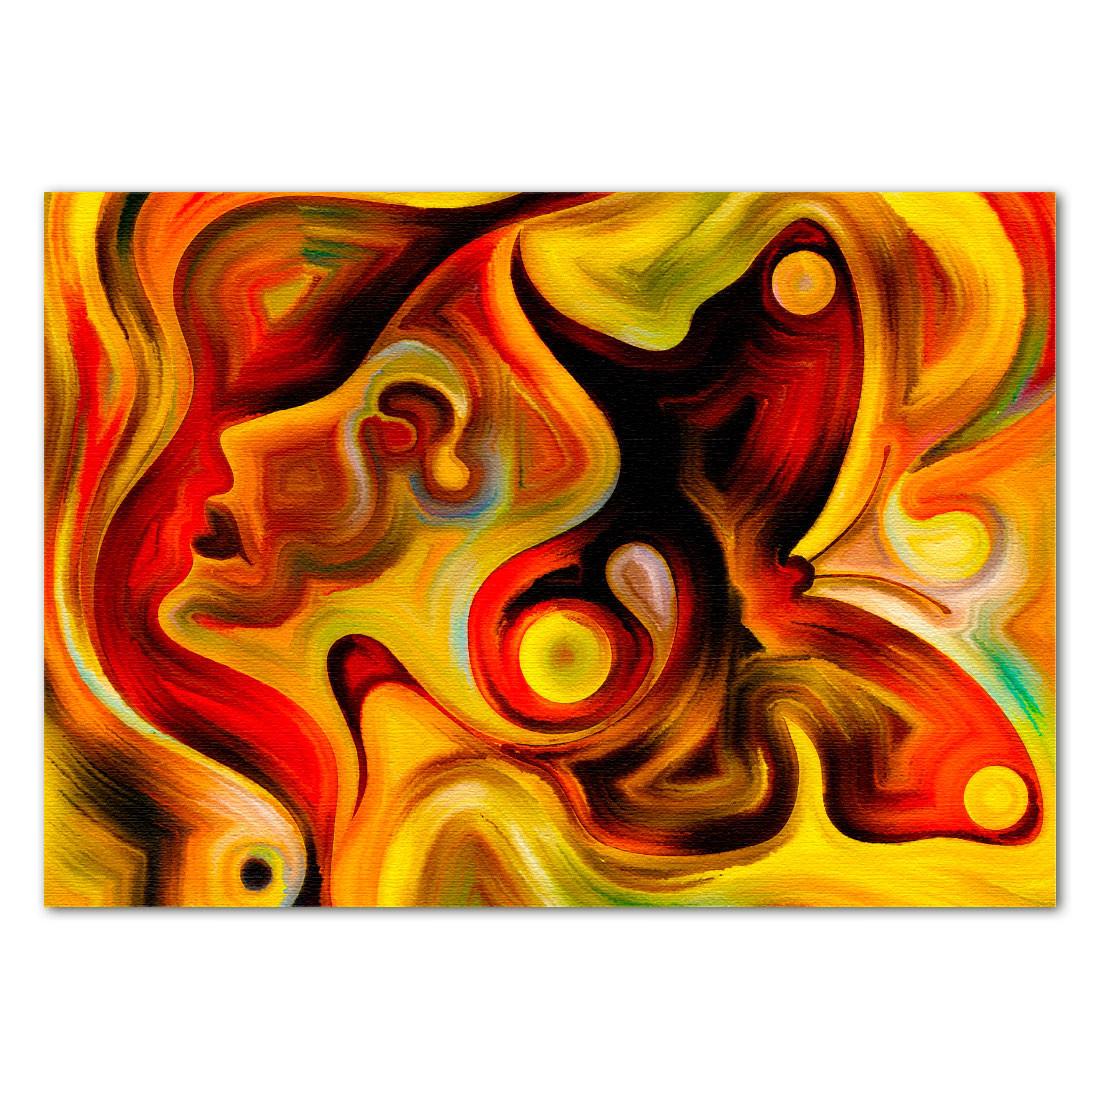 Quadro Decorativo Borboleta Abstrata em canvas